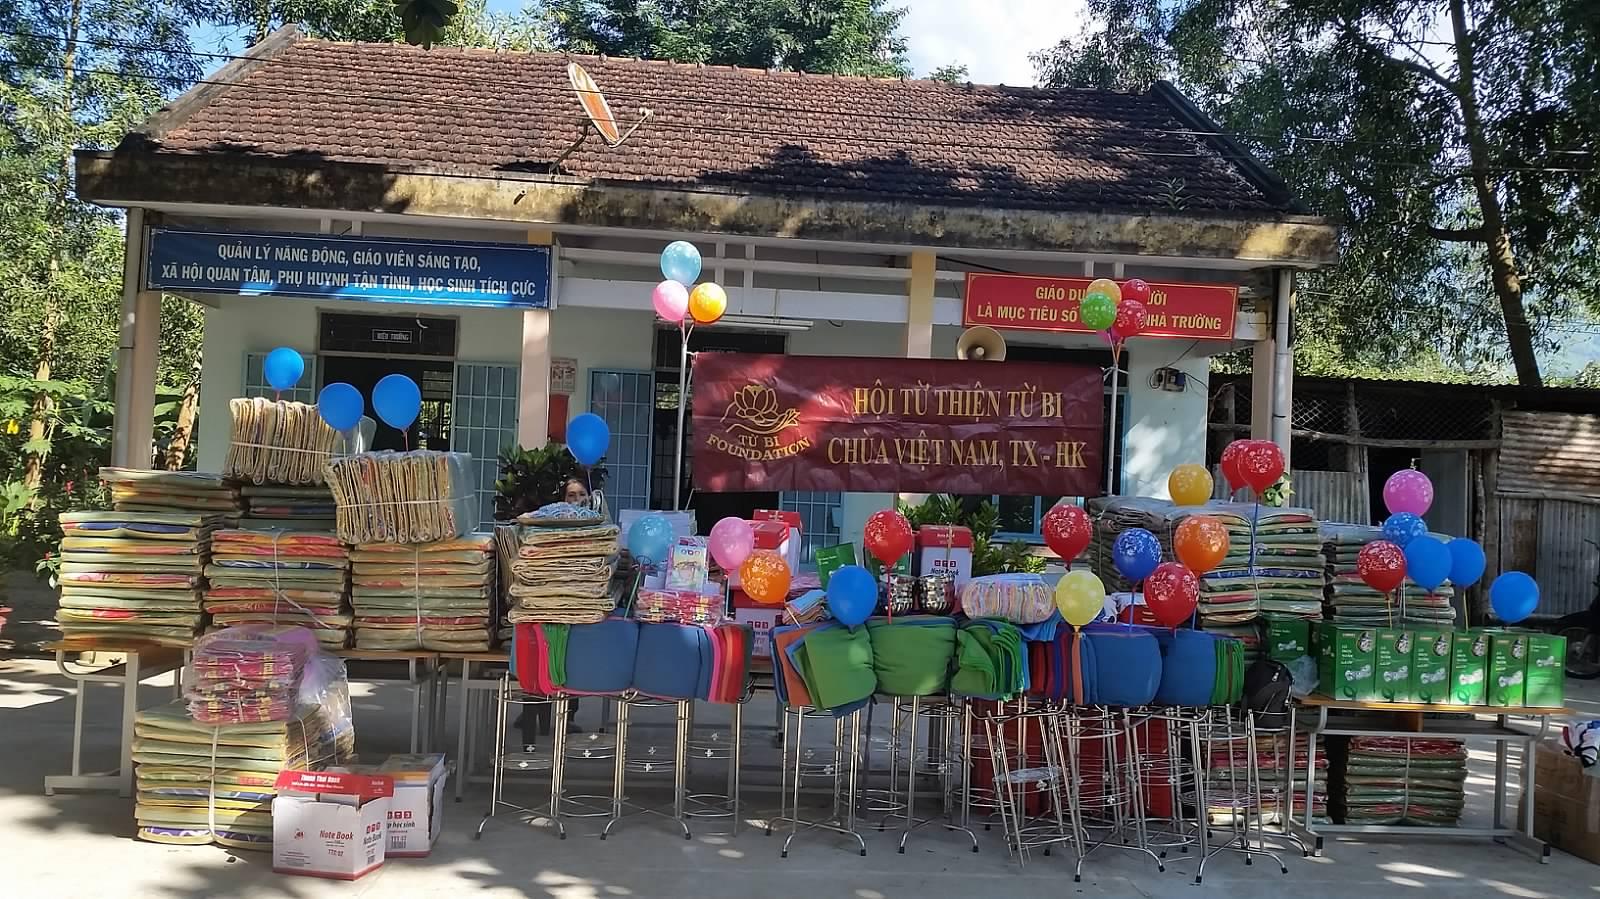 TQ Tieu Hoc Khanh Thuong 36